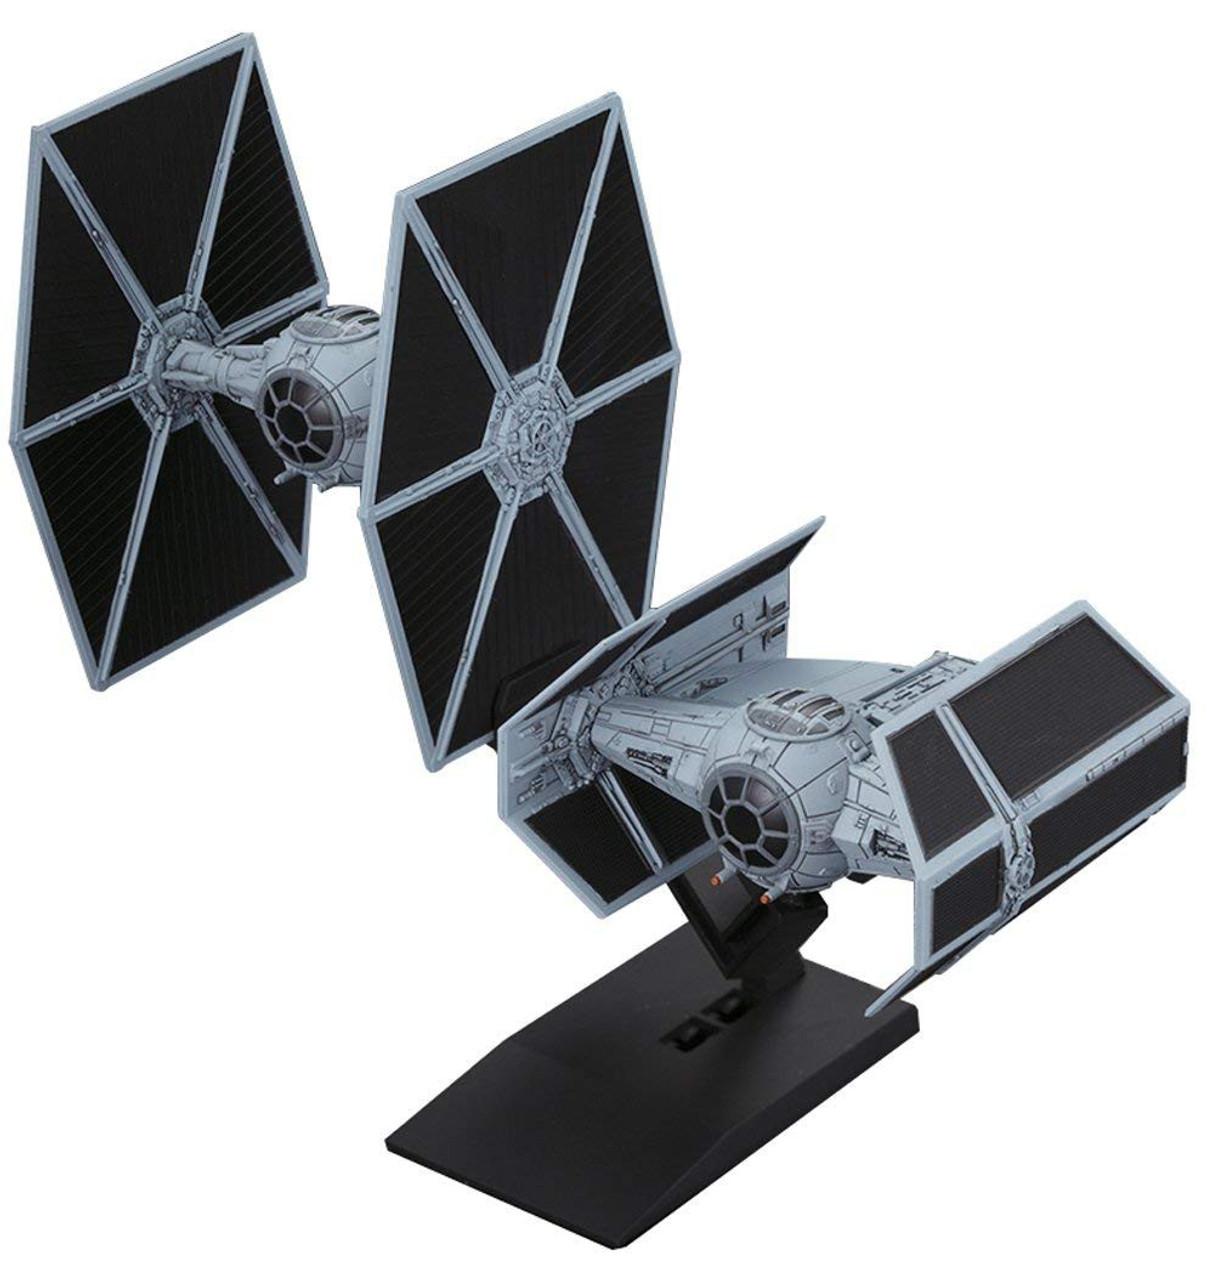 Star Wars Tie Advanced &Tie Fighter Set 1/144 Model Kit